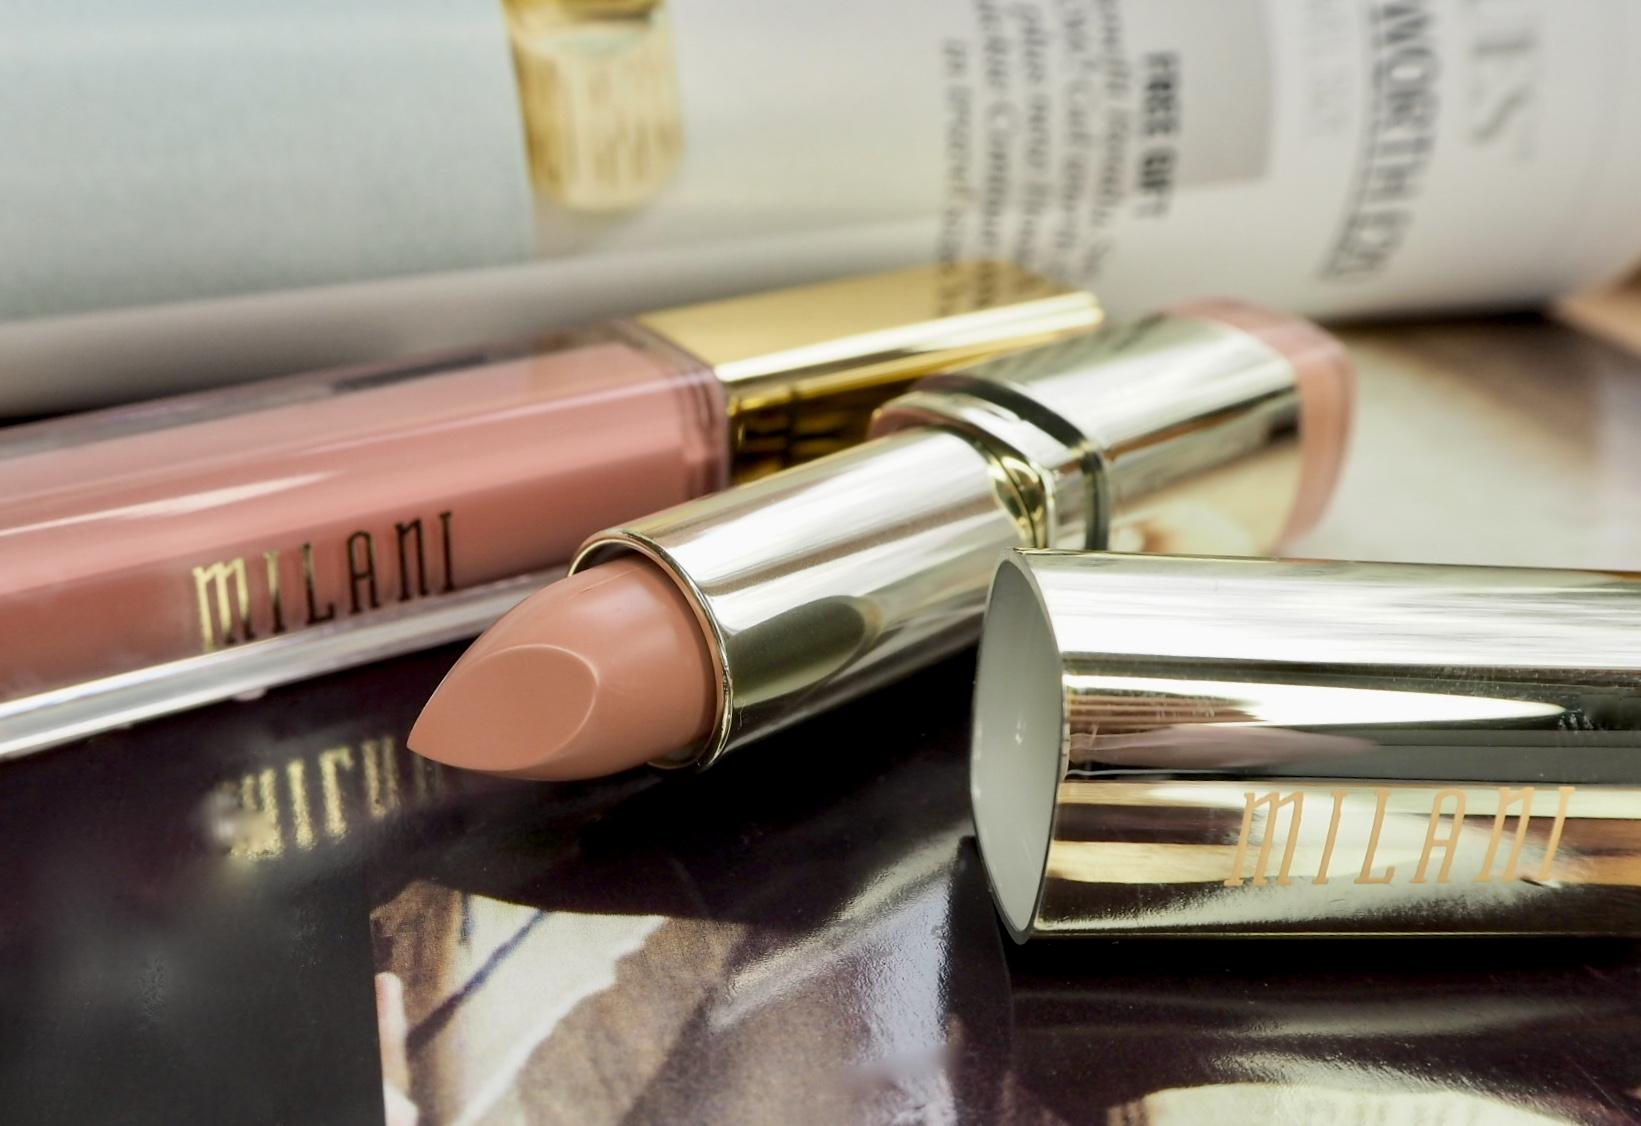 Milani Matte lipstick in Innocence